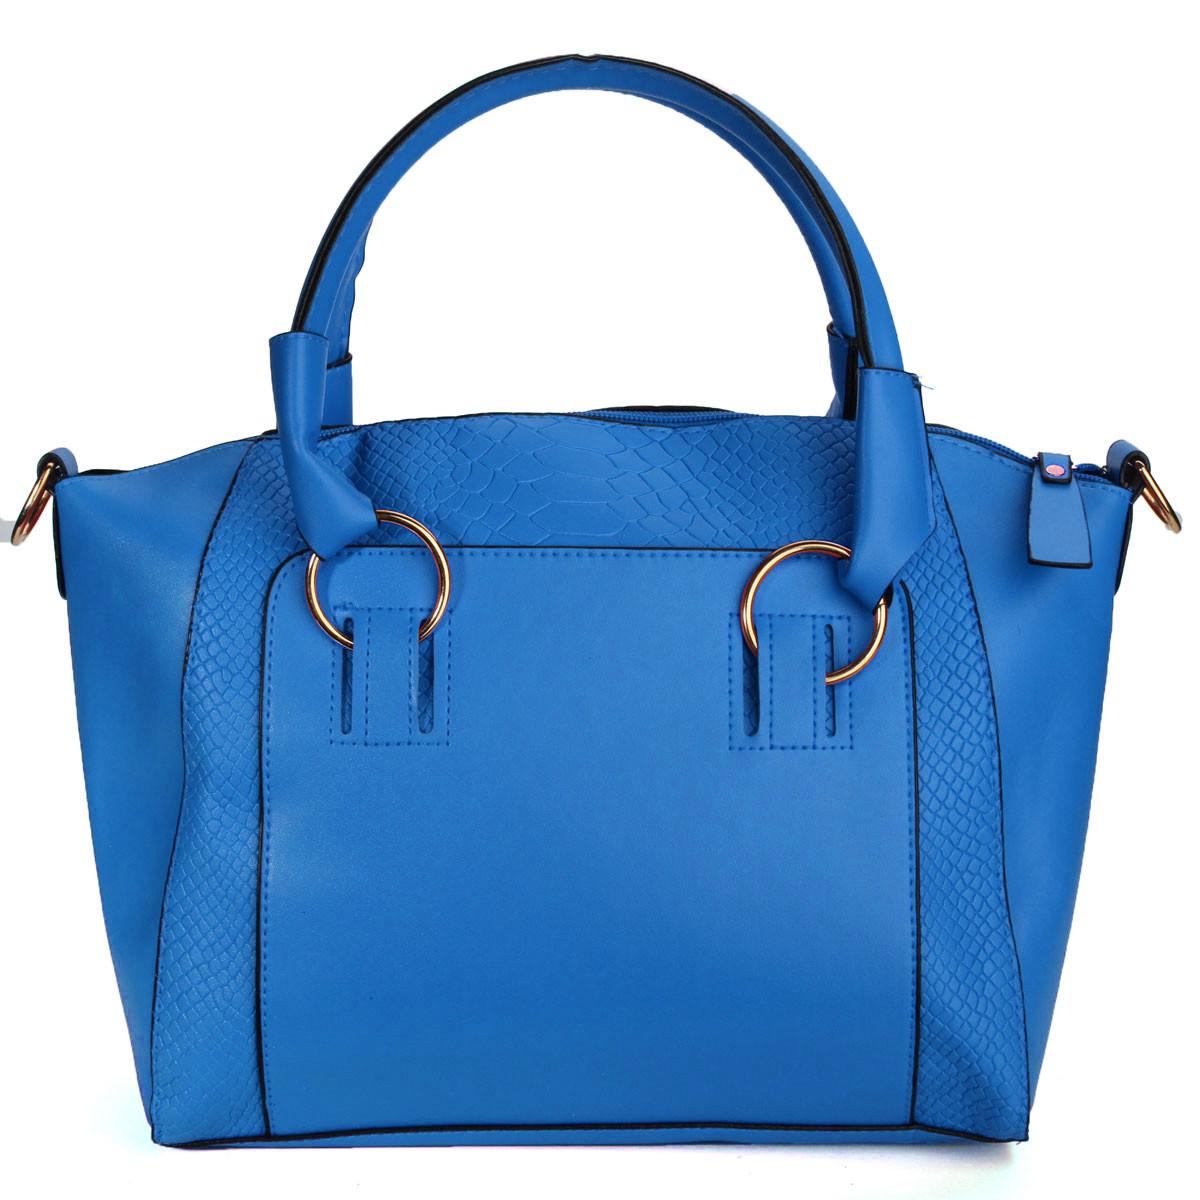 Women Lady PU Leather Handbag Satchel Crossbody Tote Shoulder Bag Messenger HOT